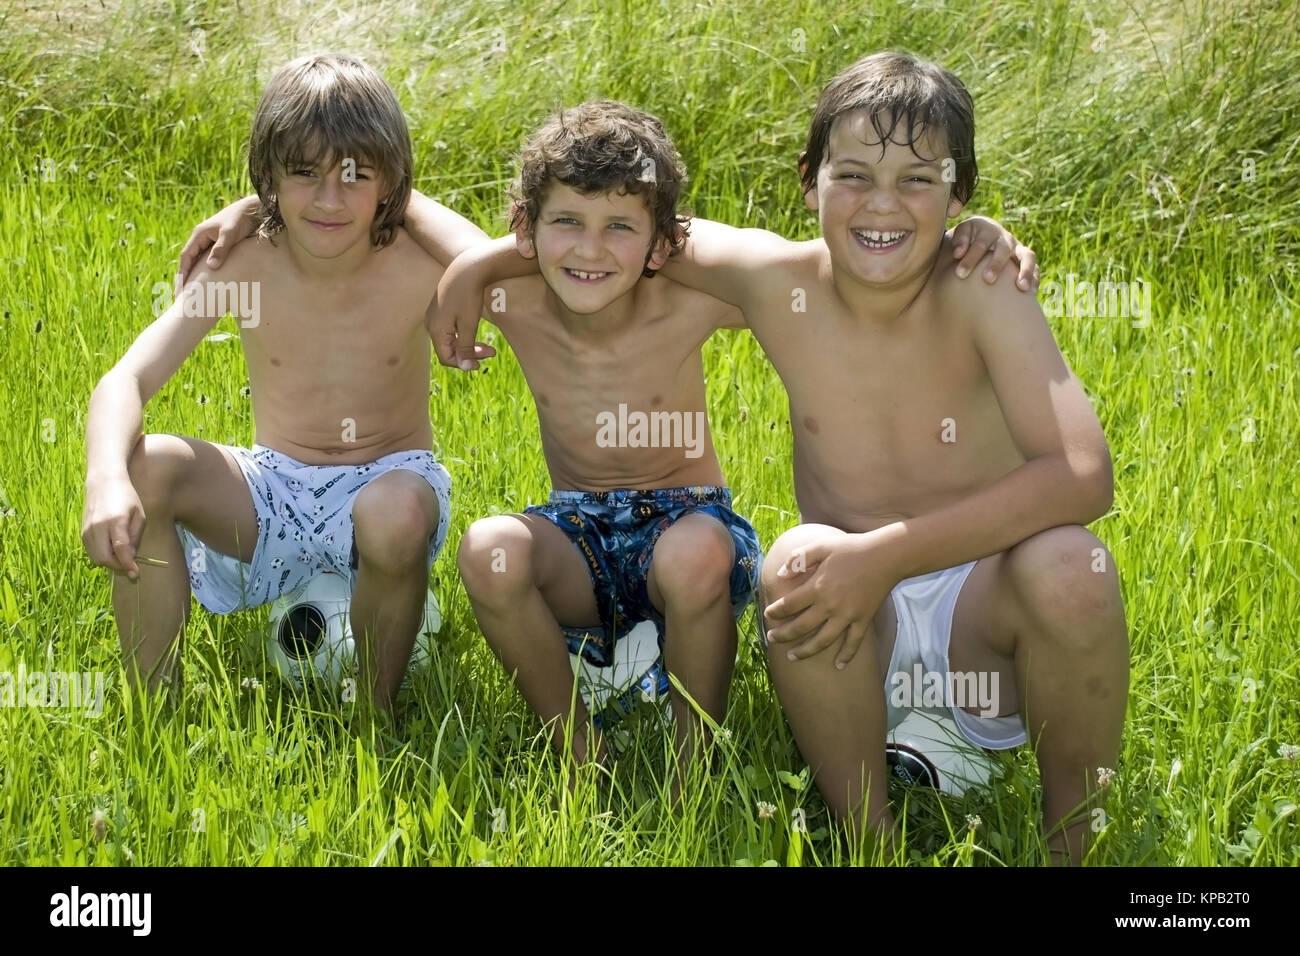 Model release, Drei Freunde in der Wiese - three boy friends - Stock Image